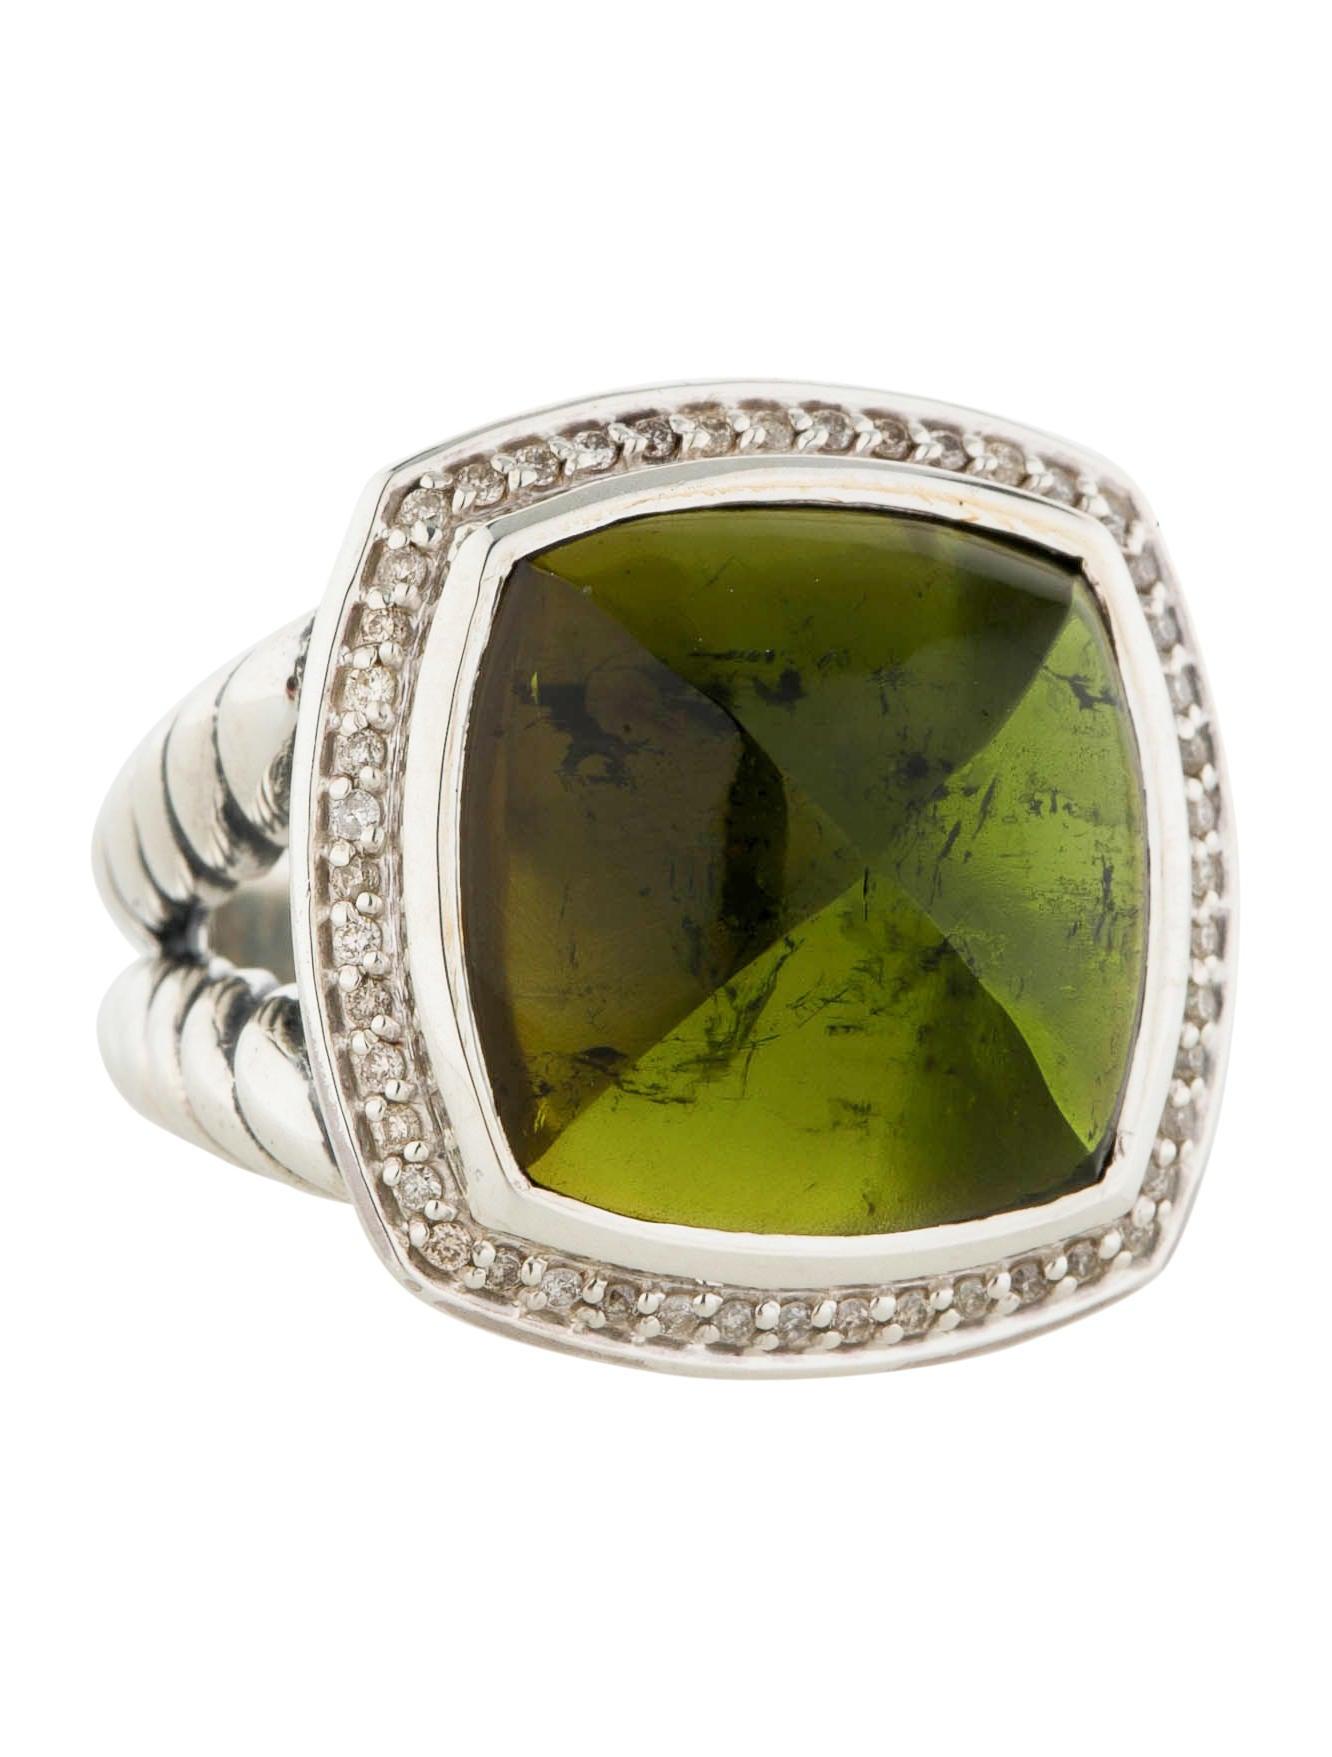 David yurman peridot diamond ring rings dvy27308 the for David yurman inspired jewelry rings